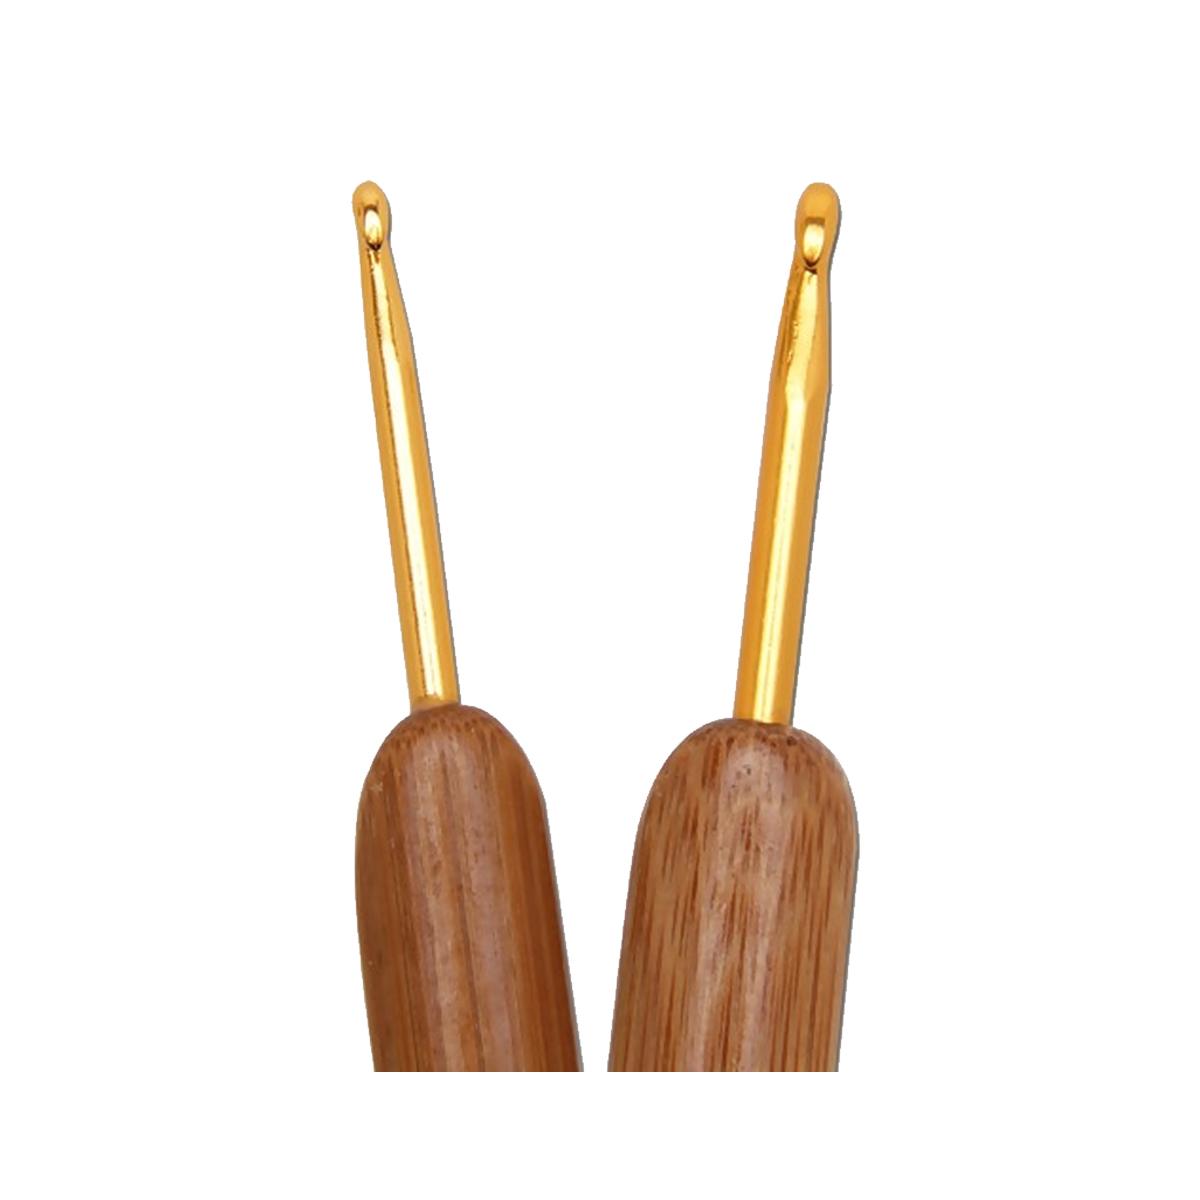 Agulha para Crochê cabo de Bambu Círculo S/A